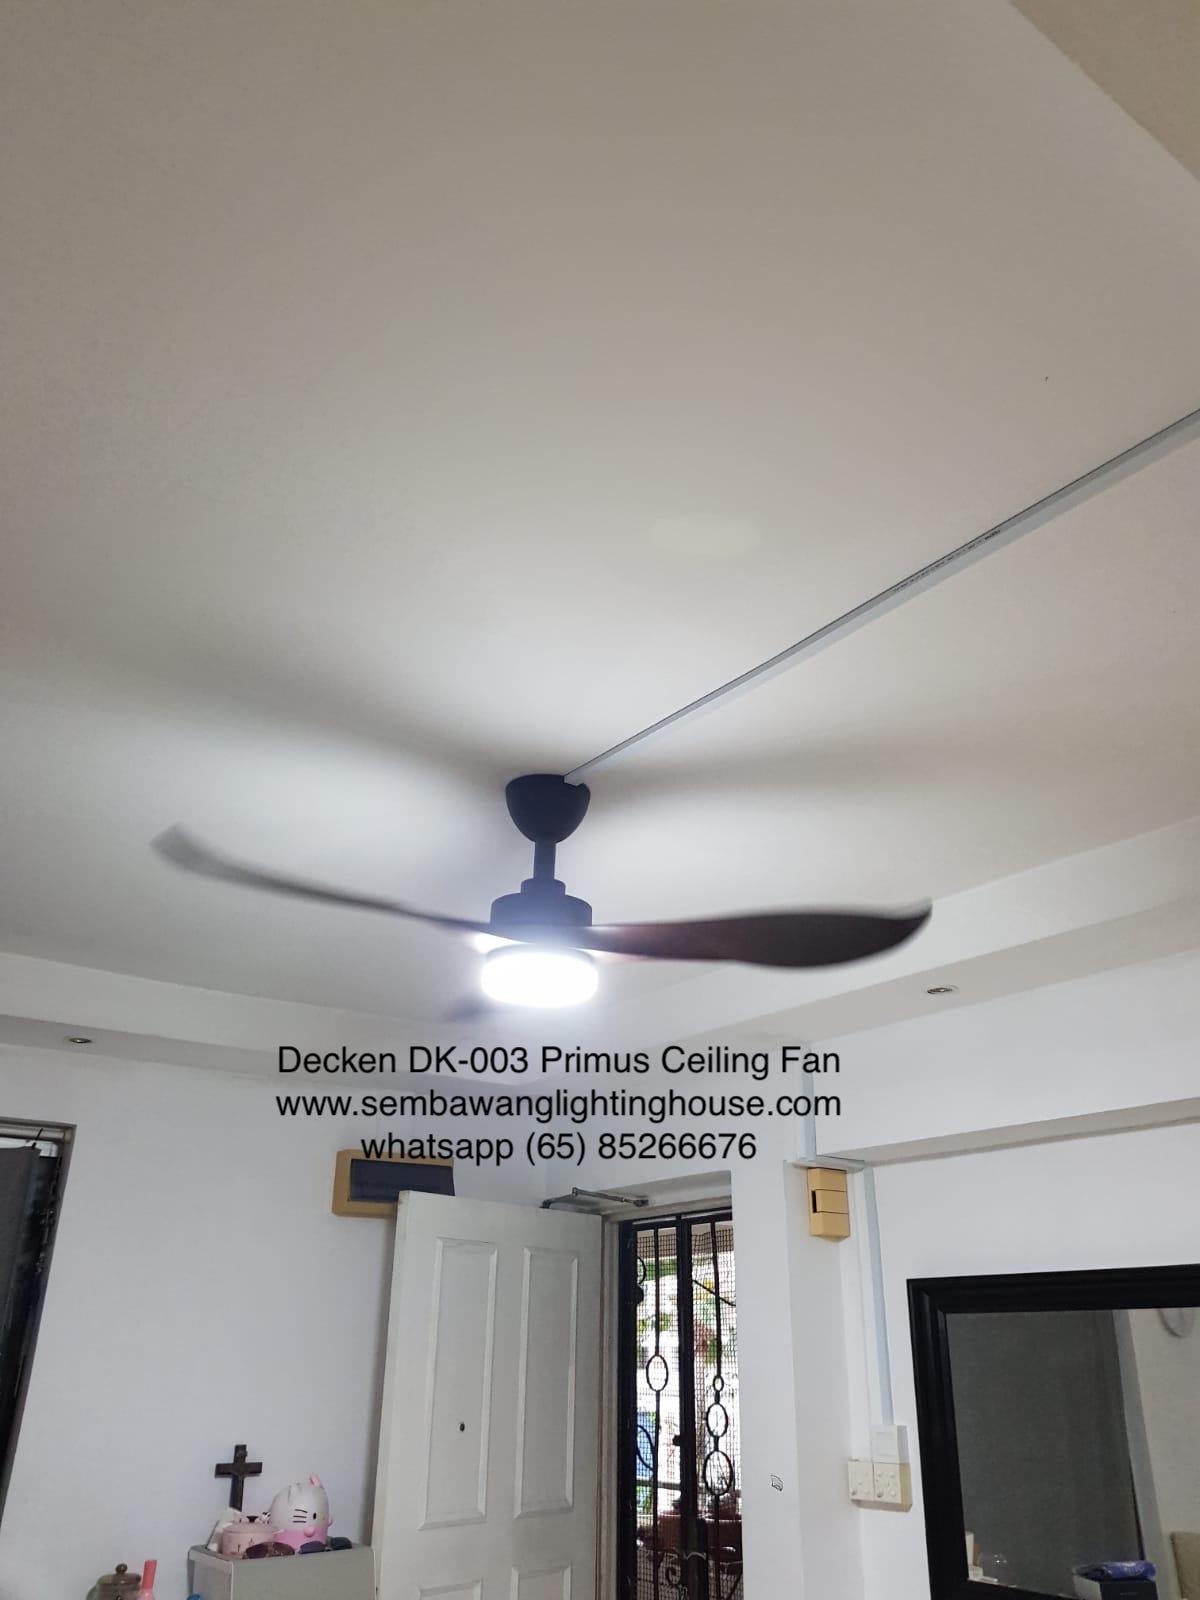 decken-dk003-ceiling-fan-01-sembawang-lighting-house.jpg